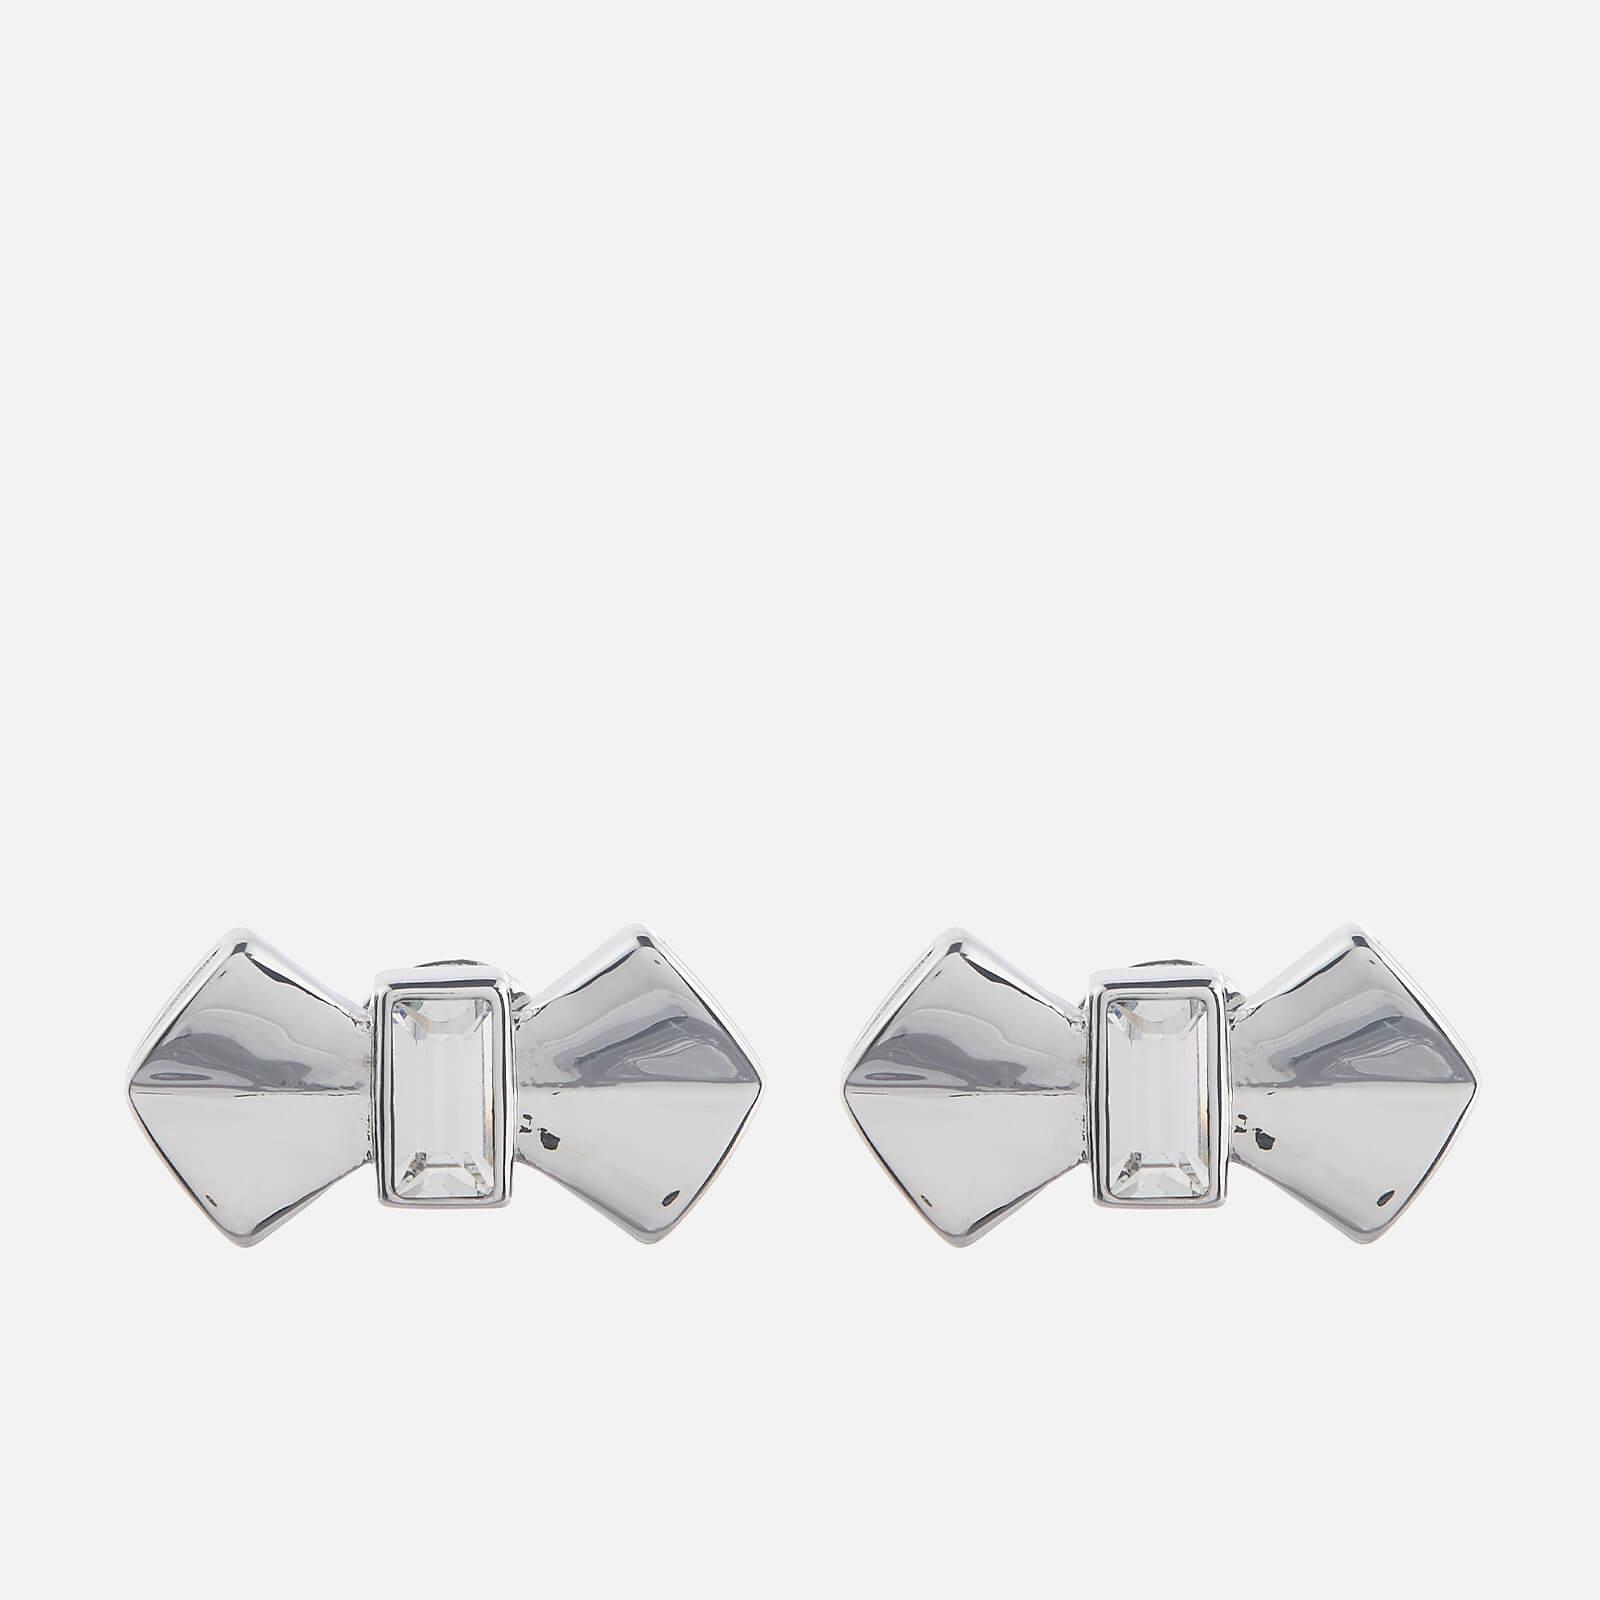 Ted Baker Women's Susli Solitaire Bow Stud Earrings - Silver